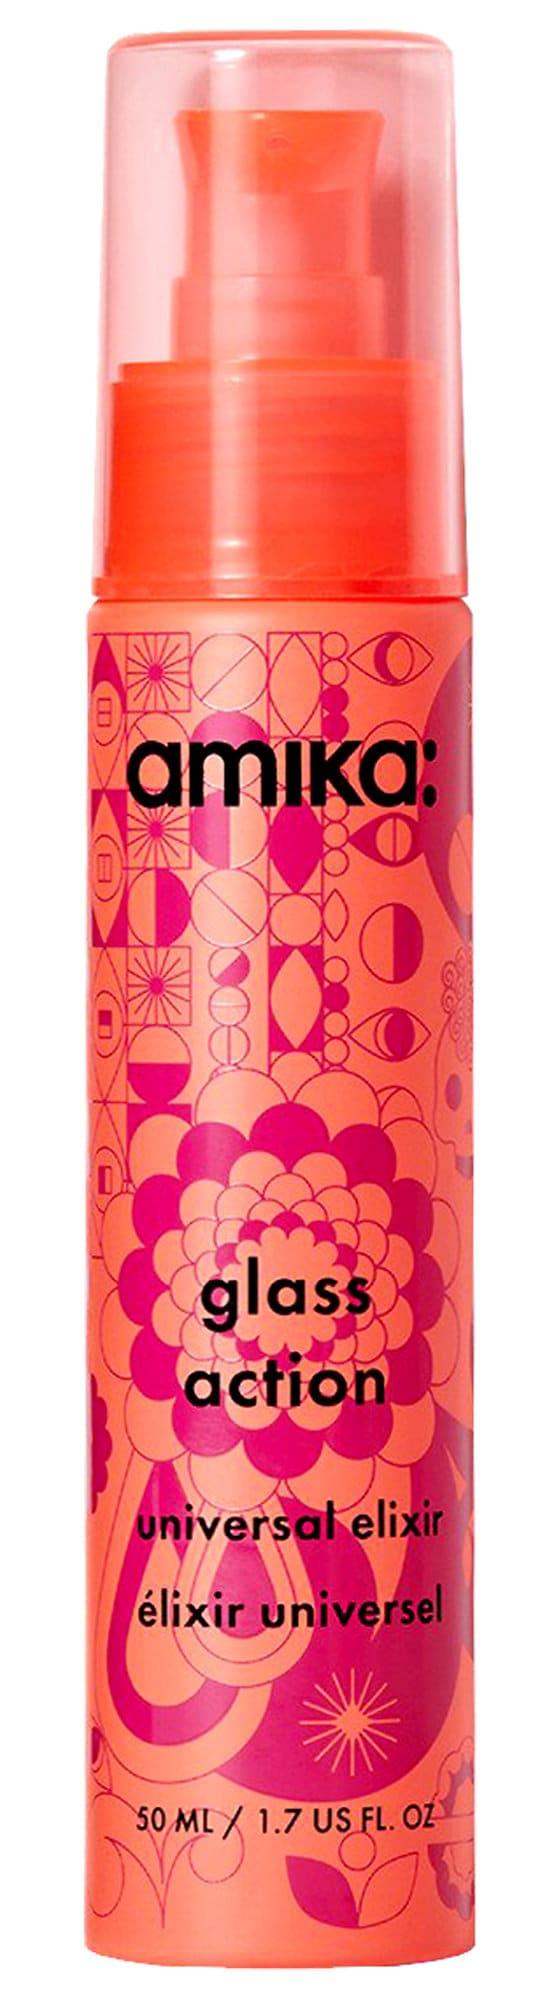 Amika Glass Action Hydrating Hair Oil Universal Elixir